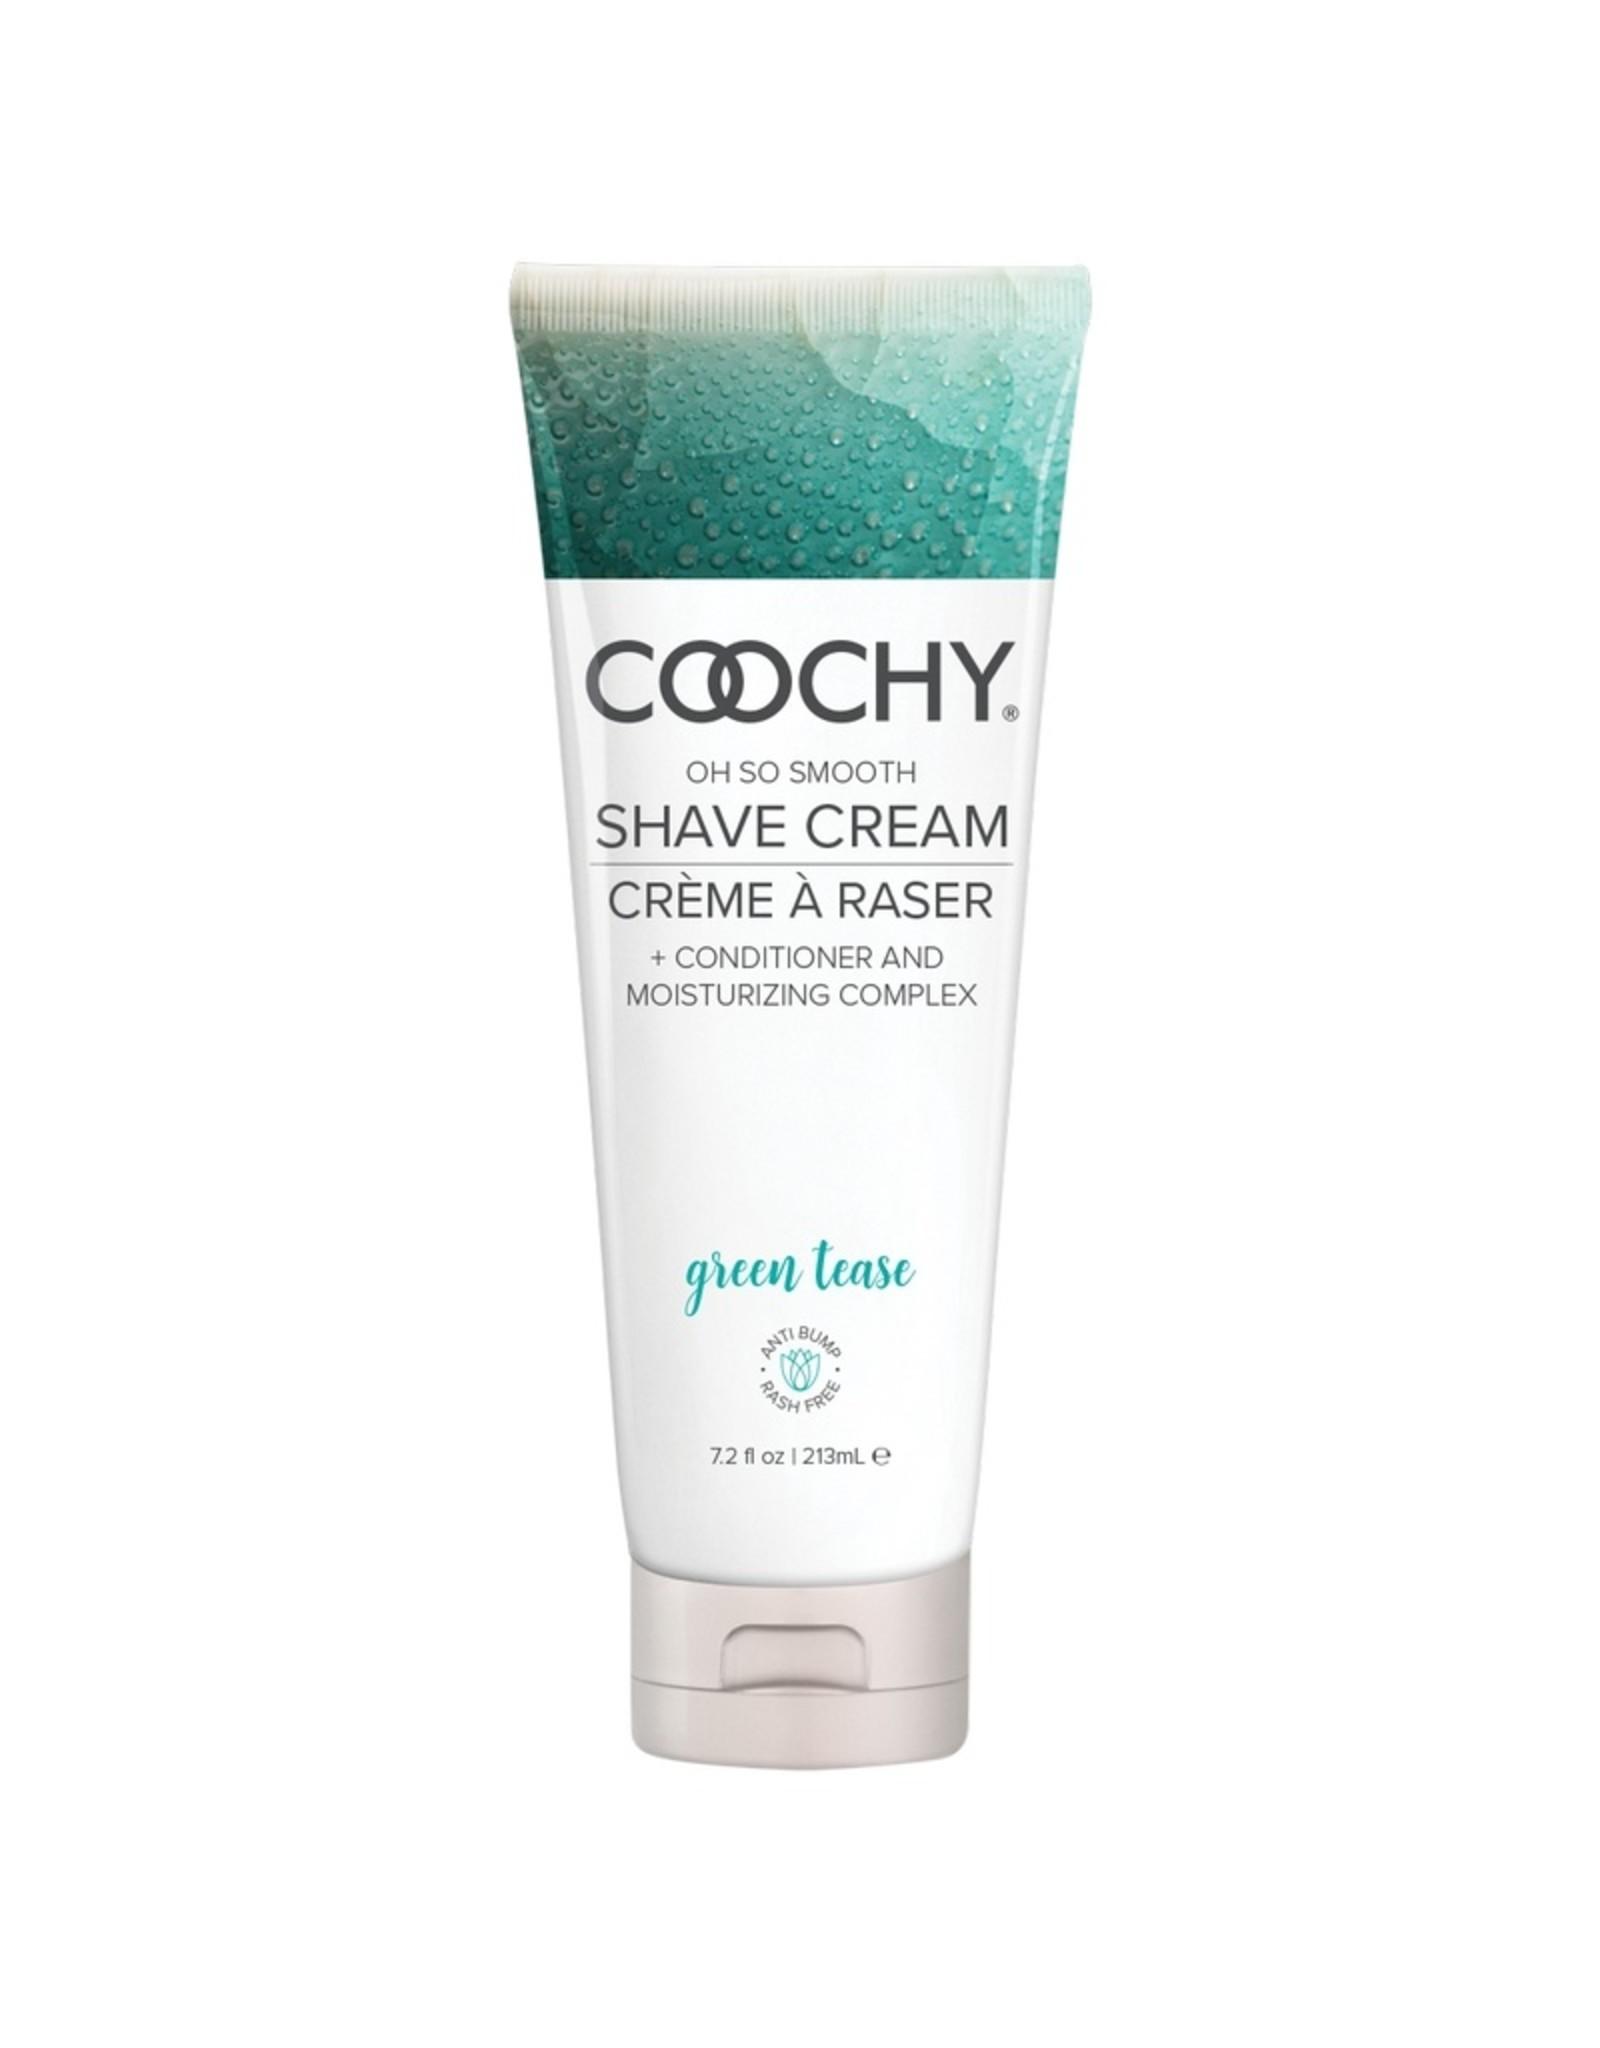 Classic Brands Coochy - Green Tease - 7.2 oz